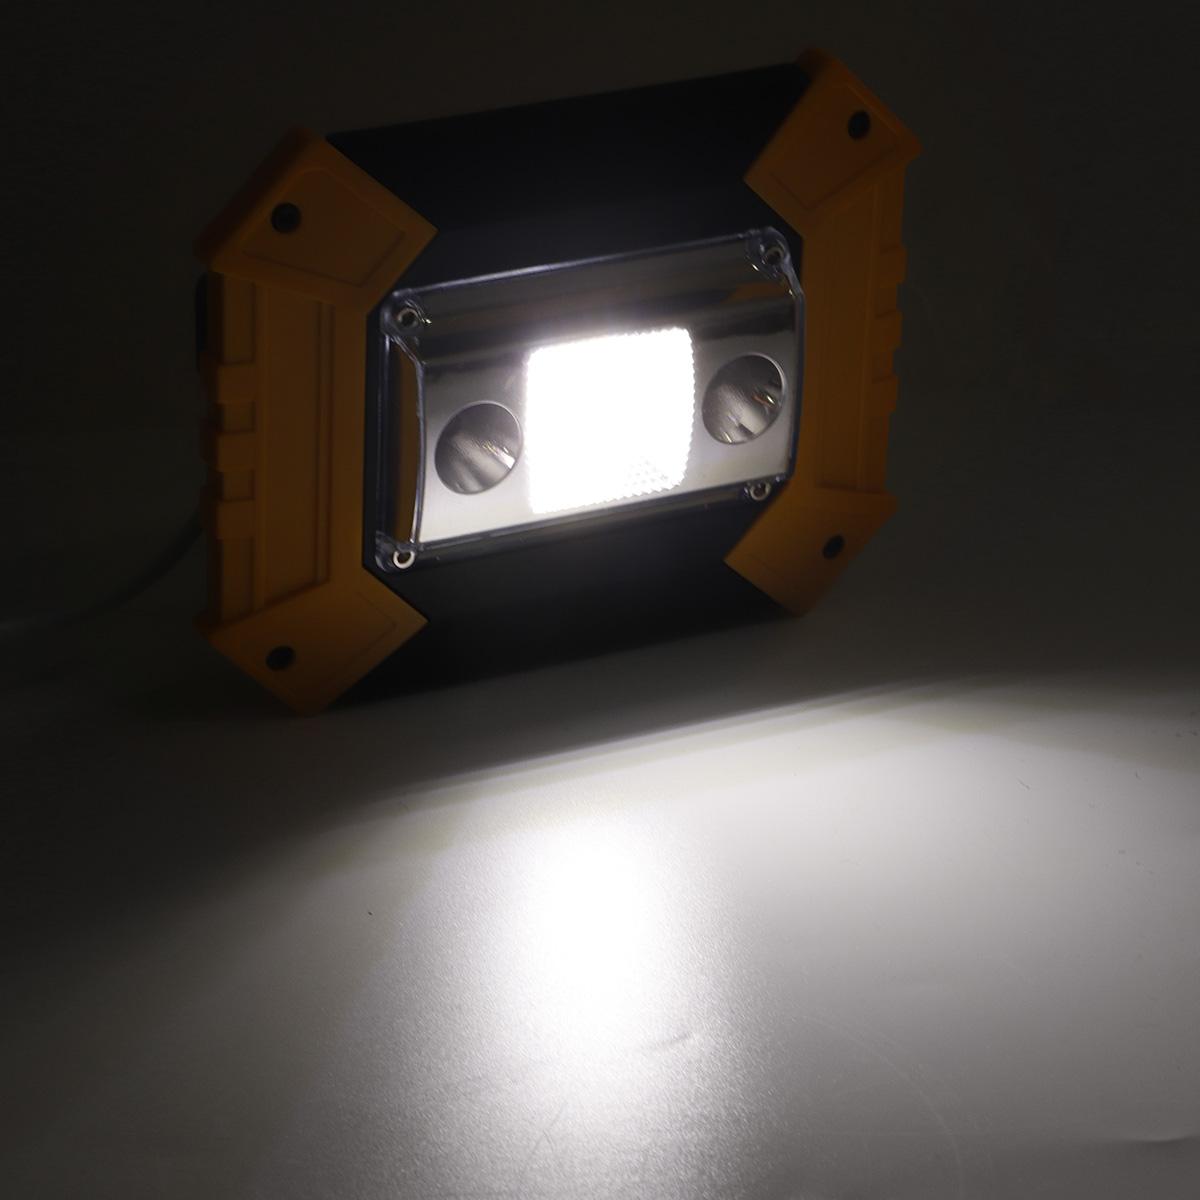 30W COB LED USB Work Light Spotlight Waterproof 5 Modes Flood Lamp Outdoor Camping Emergency Lantern